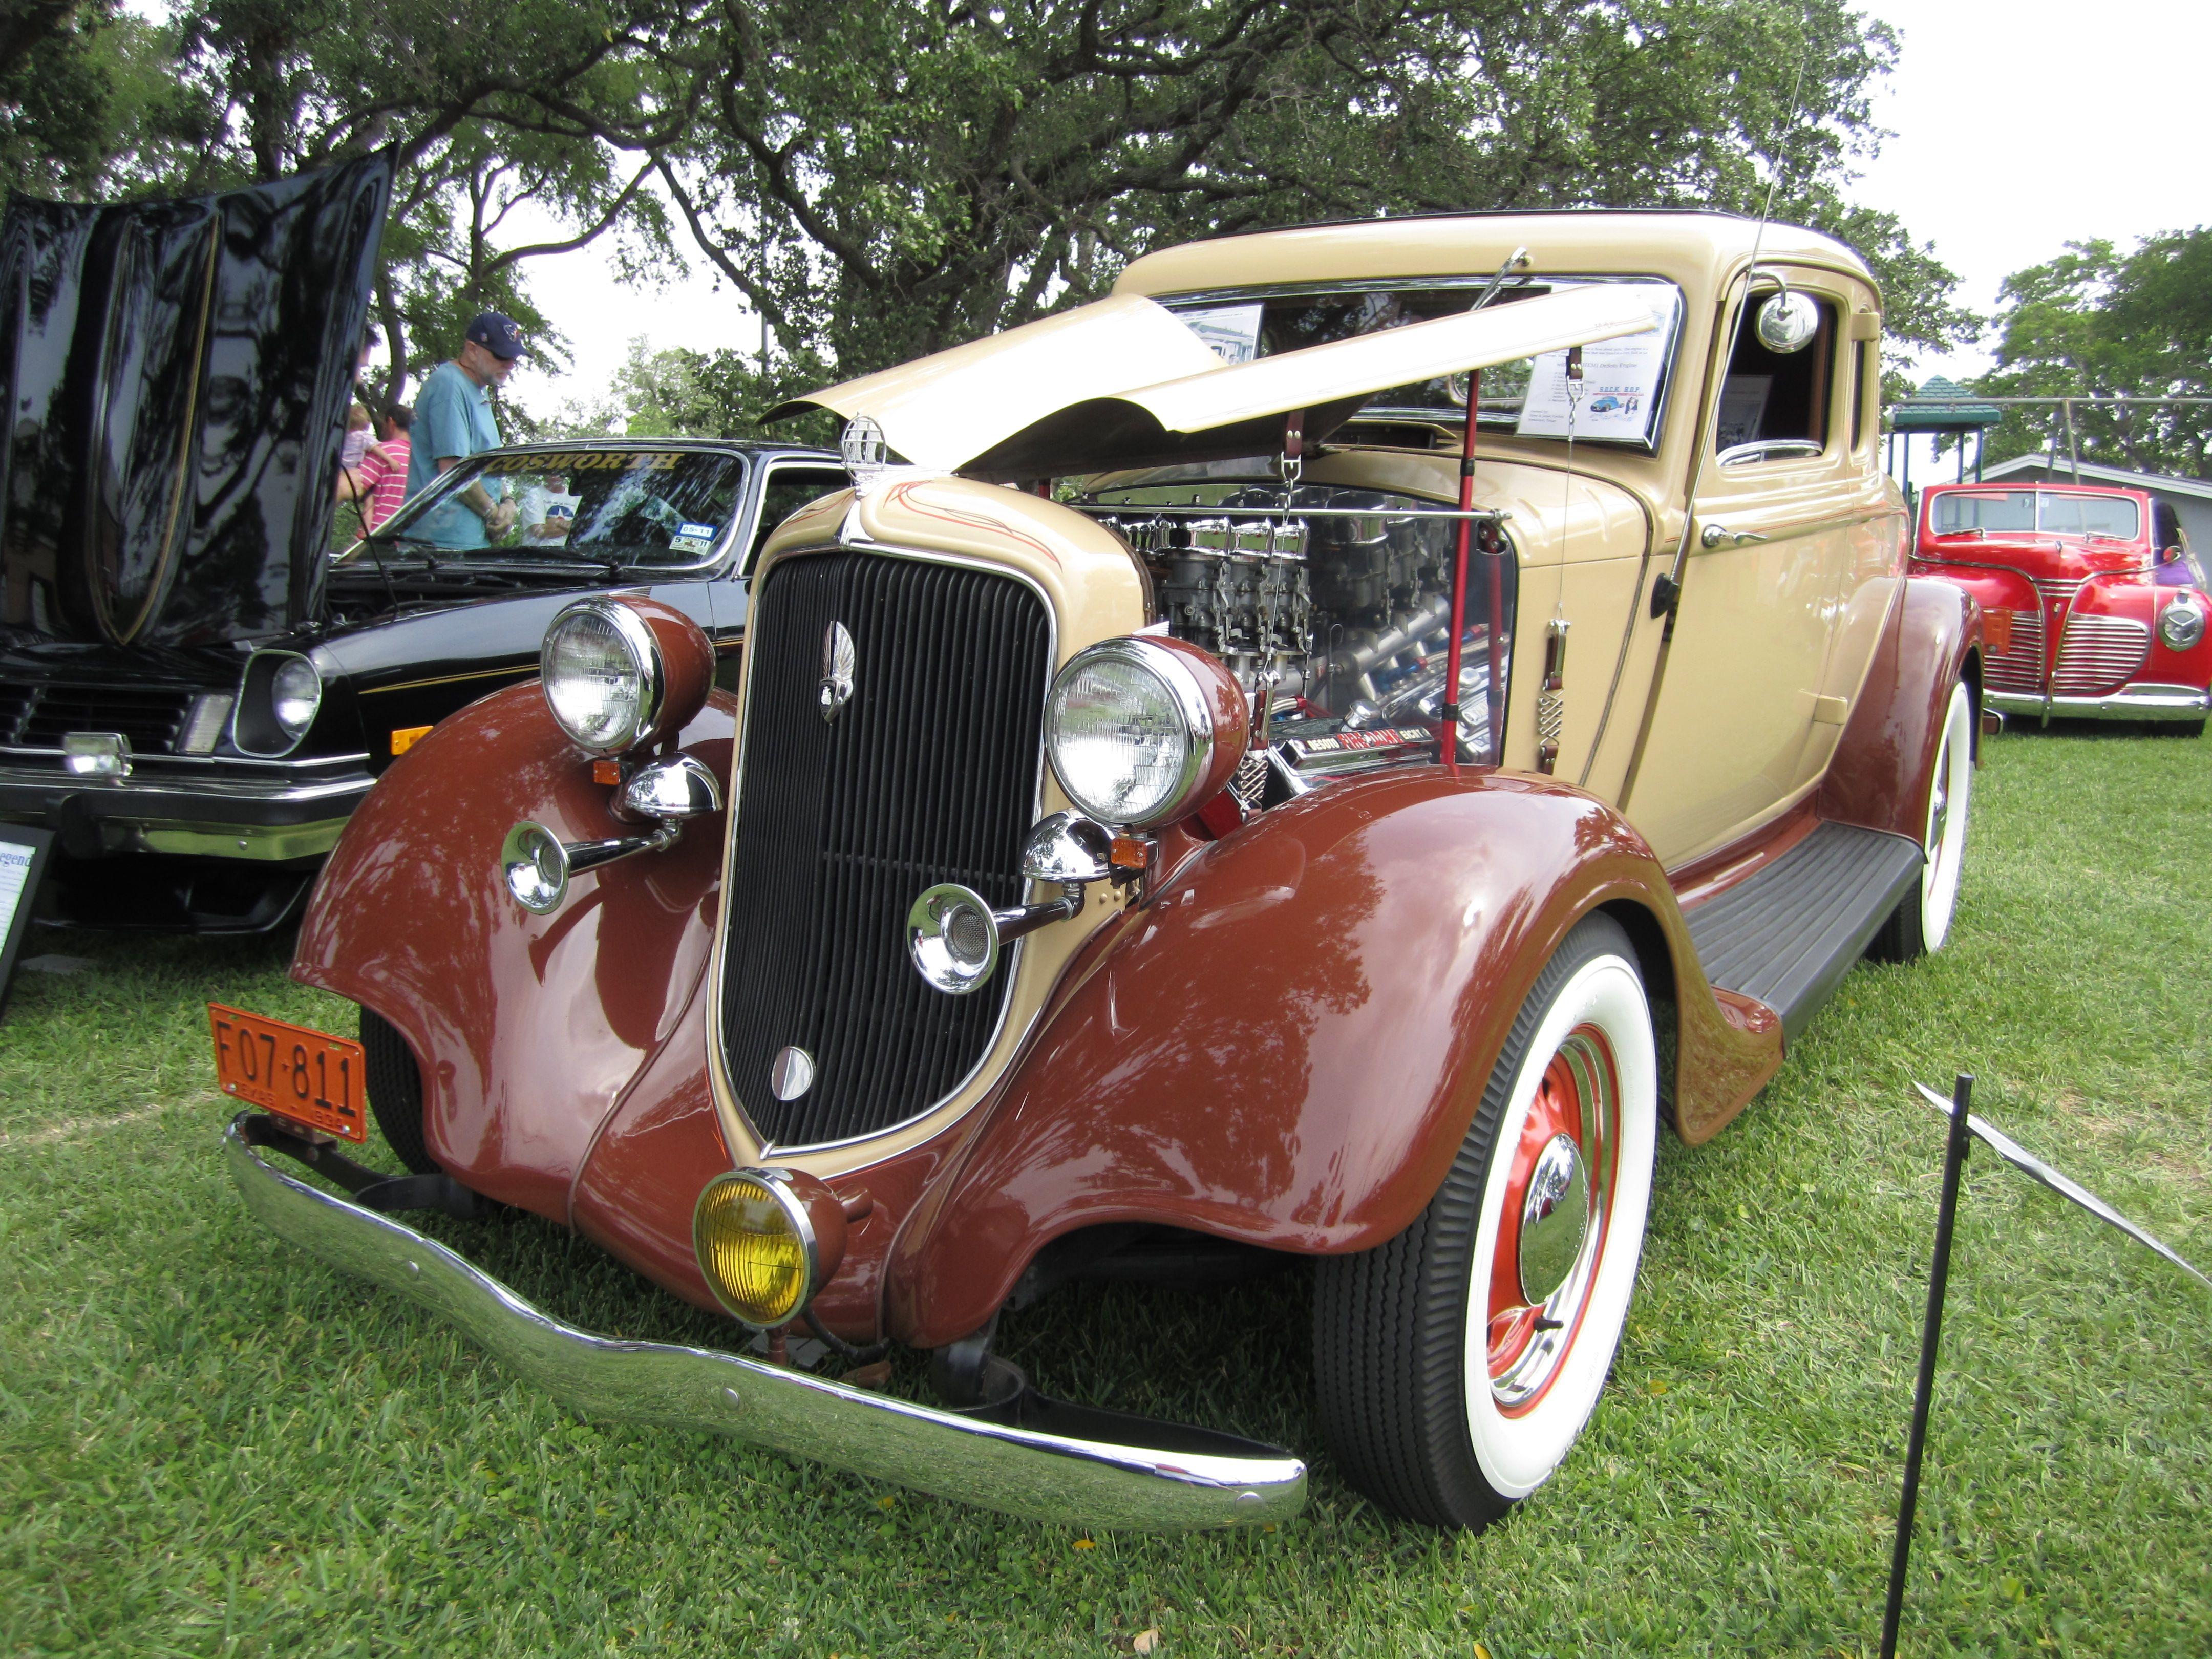 The University of Texas Rio Grande Valley UTRGV Vaqueros ... |Rio Grande Valley Cars